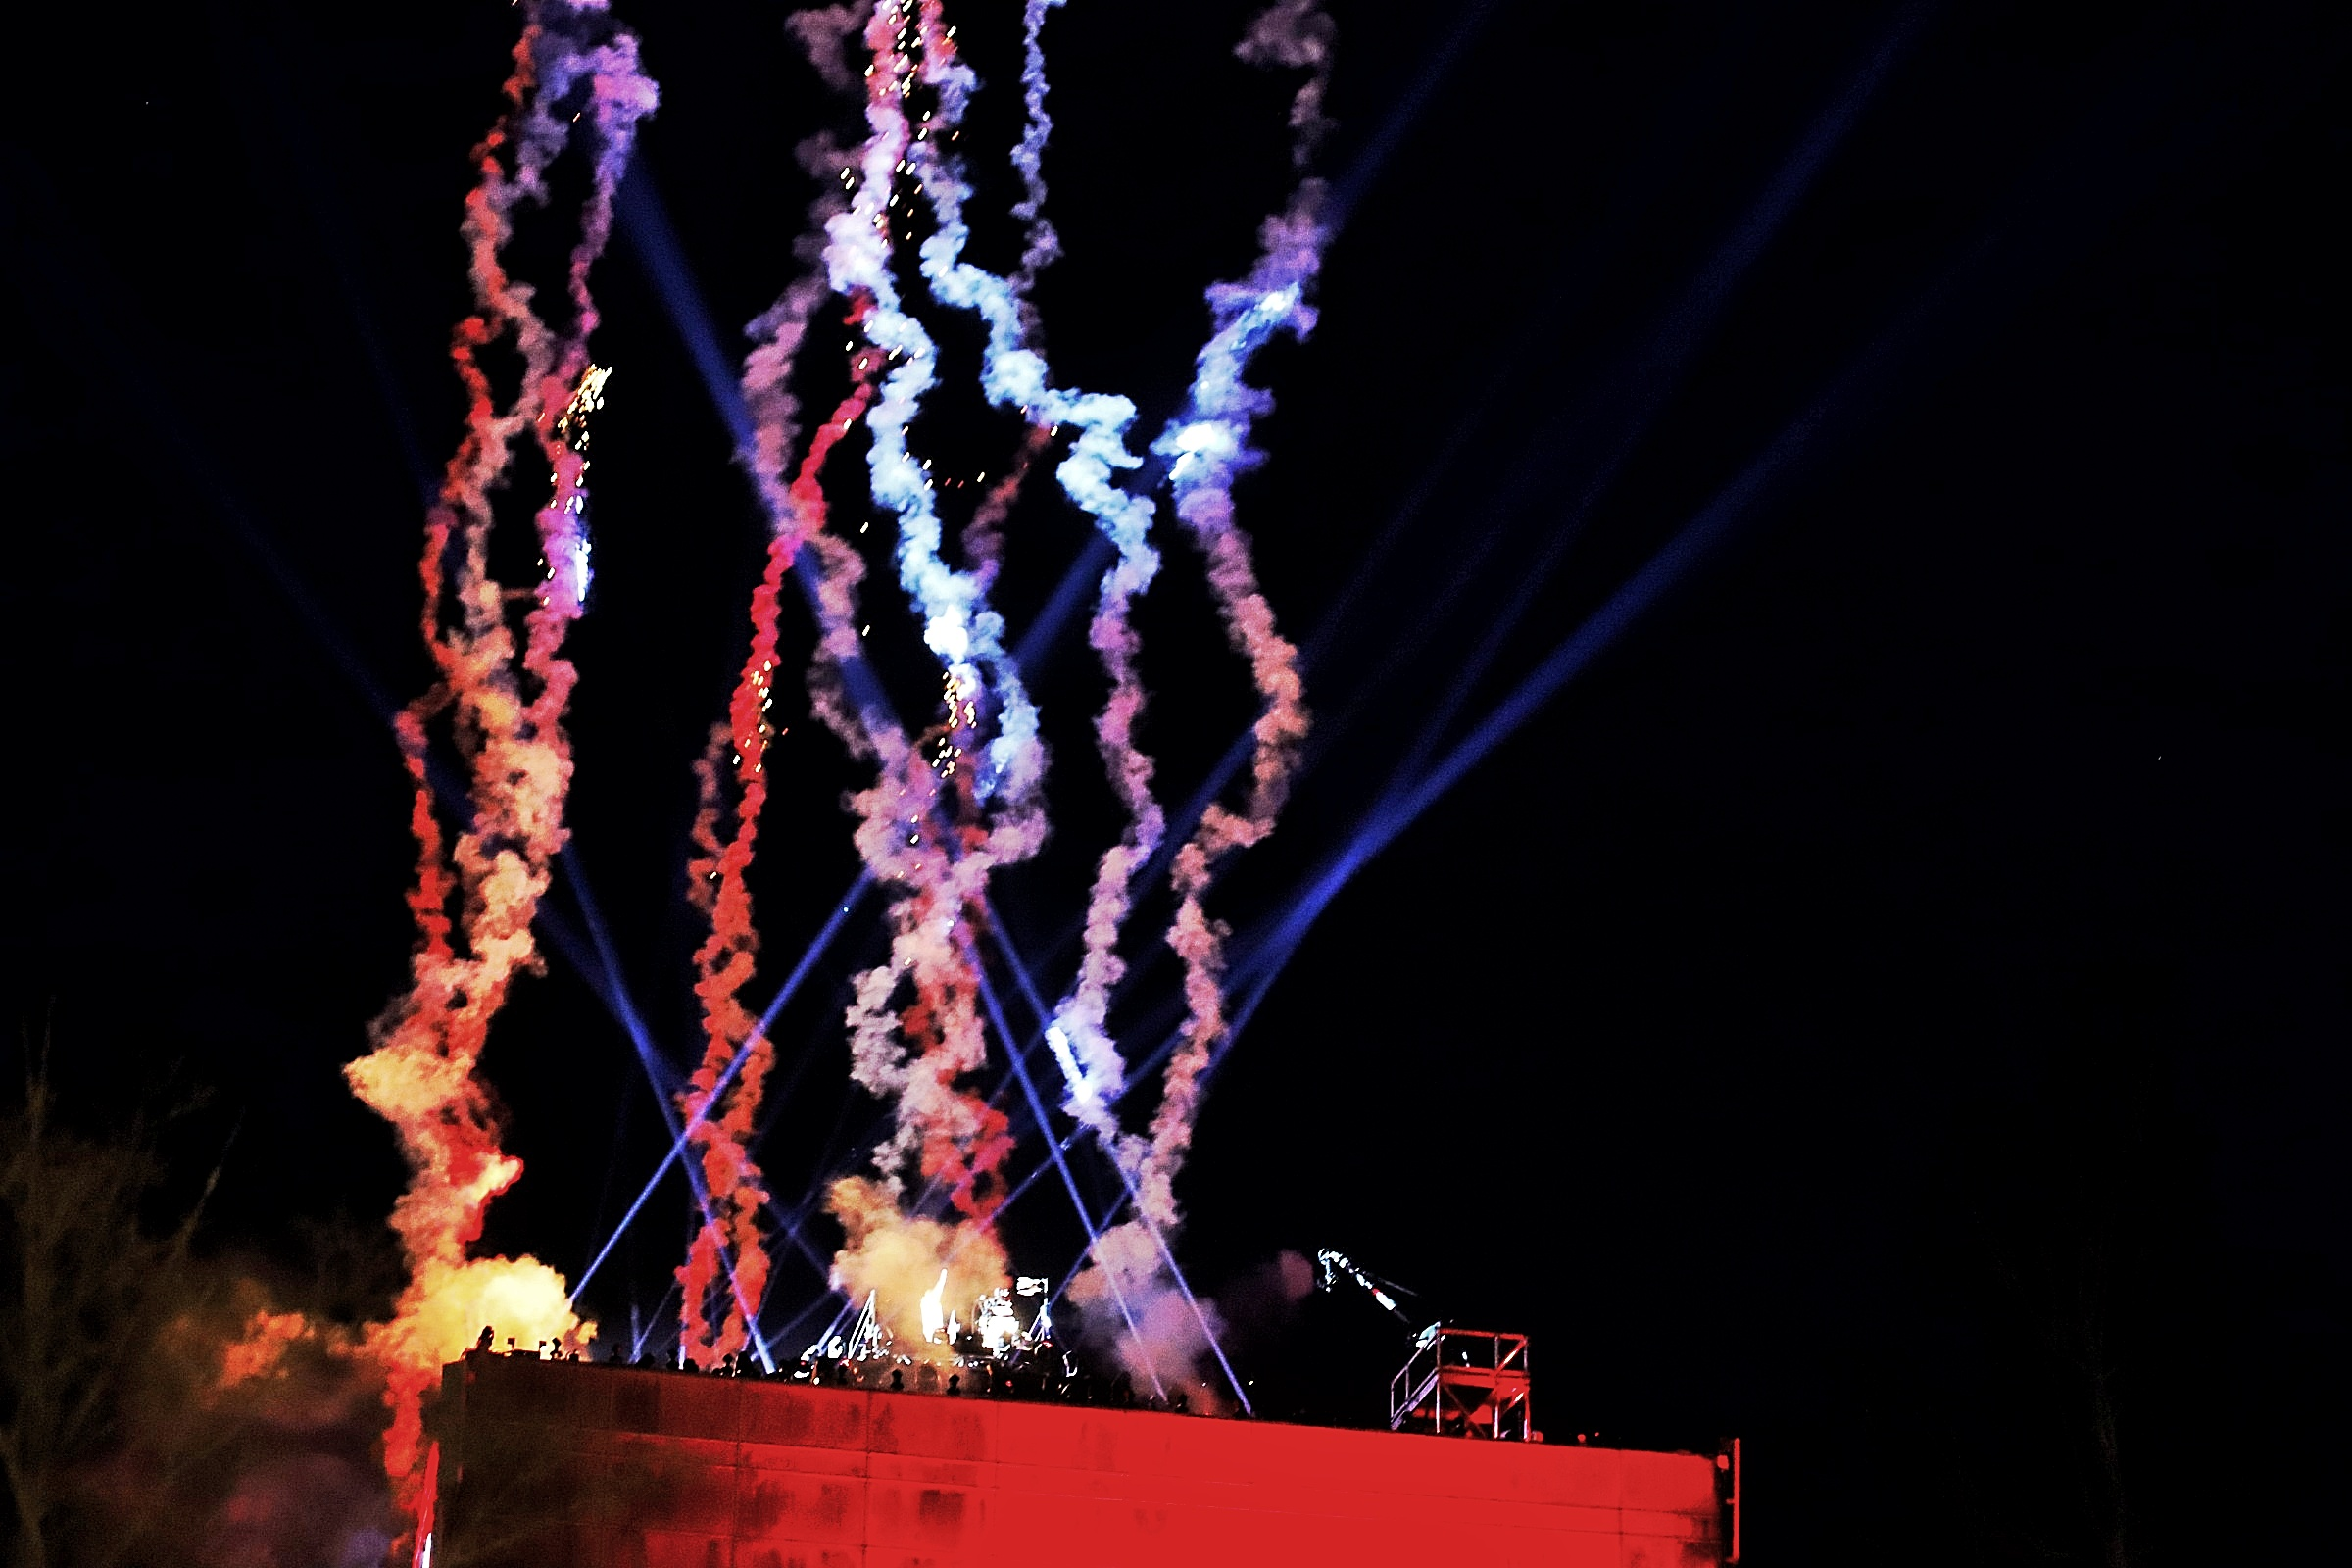 Aalborg fik kæmpe eksponering: Martin Jensen-show slog alle rekorder